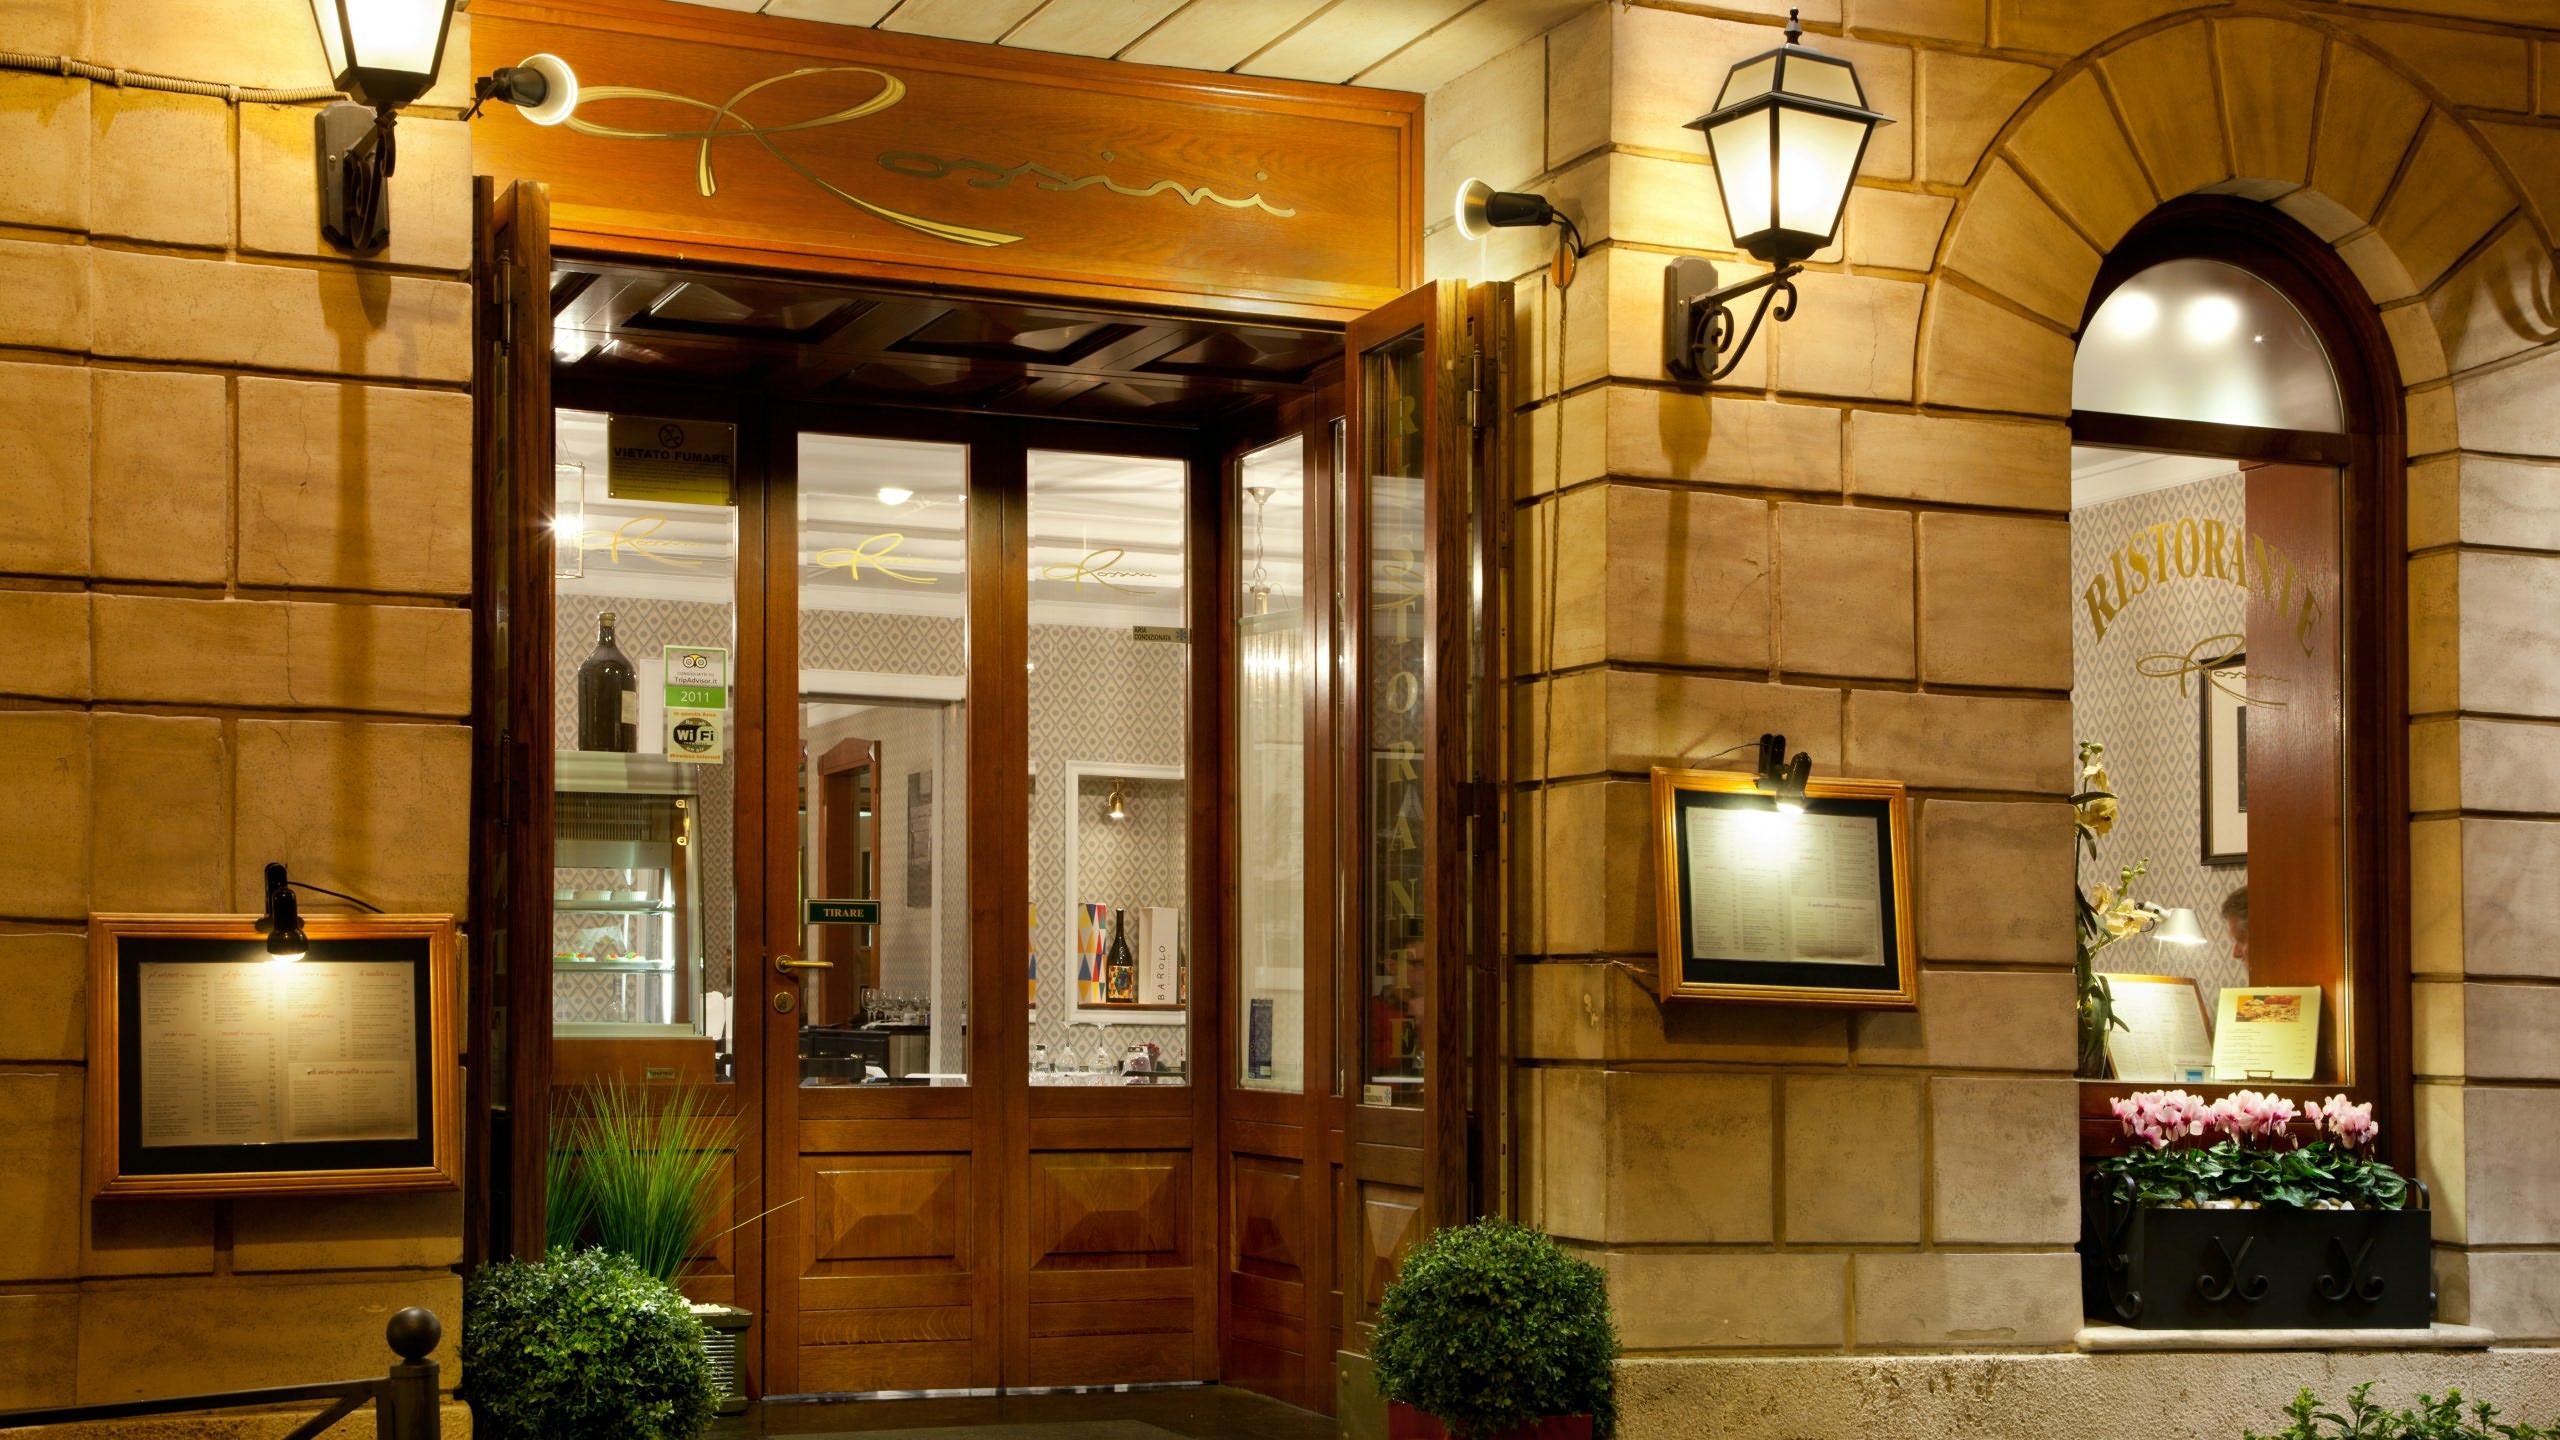 albergo-ottocento-rome-rossini-restaurant-01